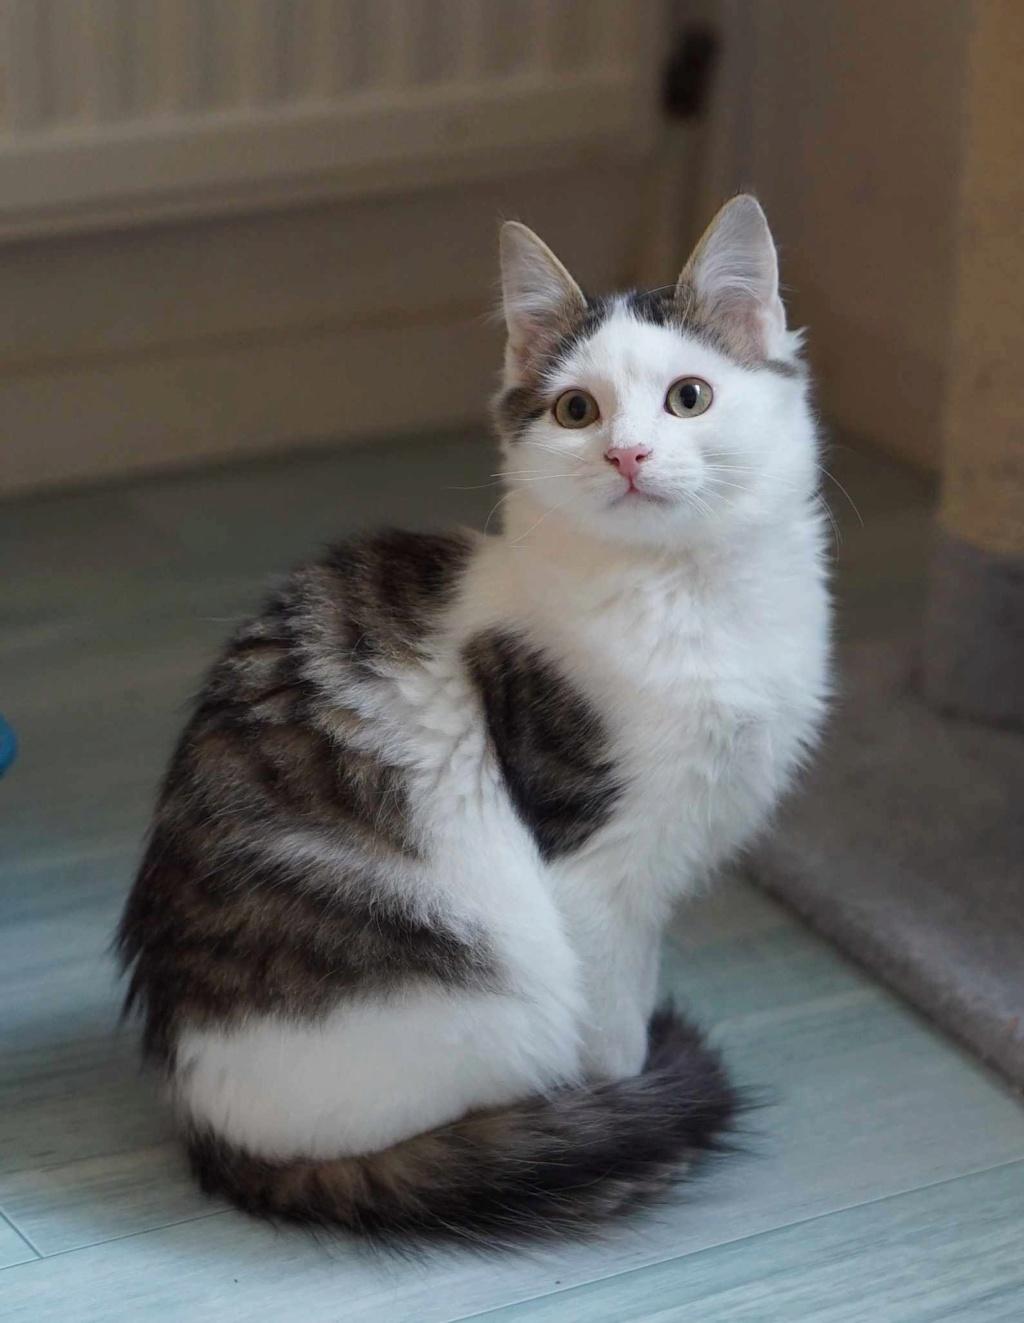 OXLAY, chaton européen tigré gris et blanc, poils mi-longs, né le 01/06/18 Oxlay_19